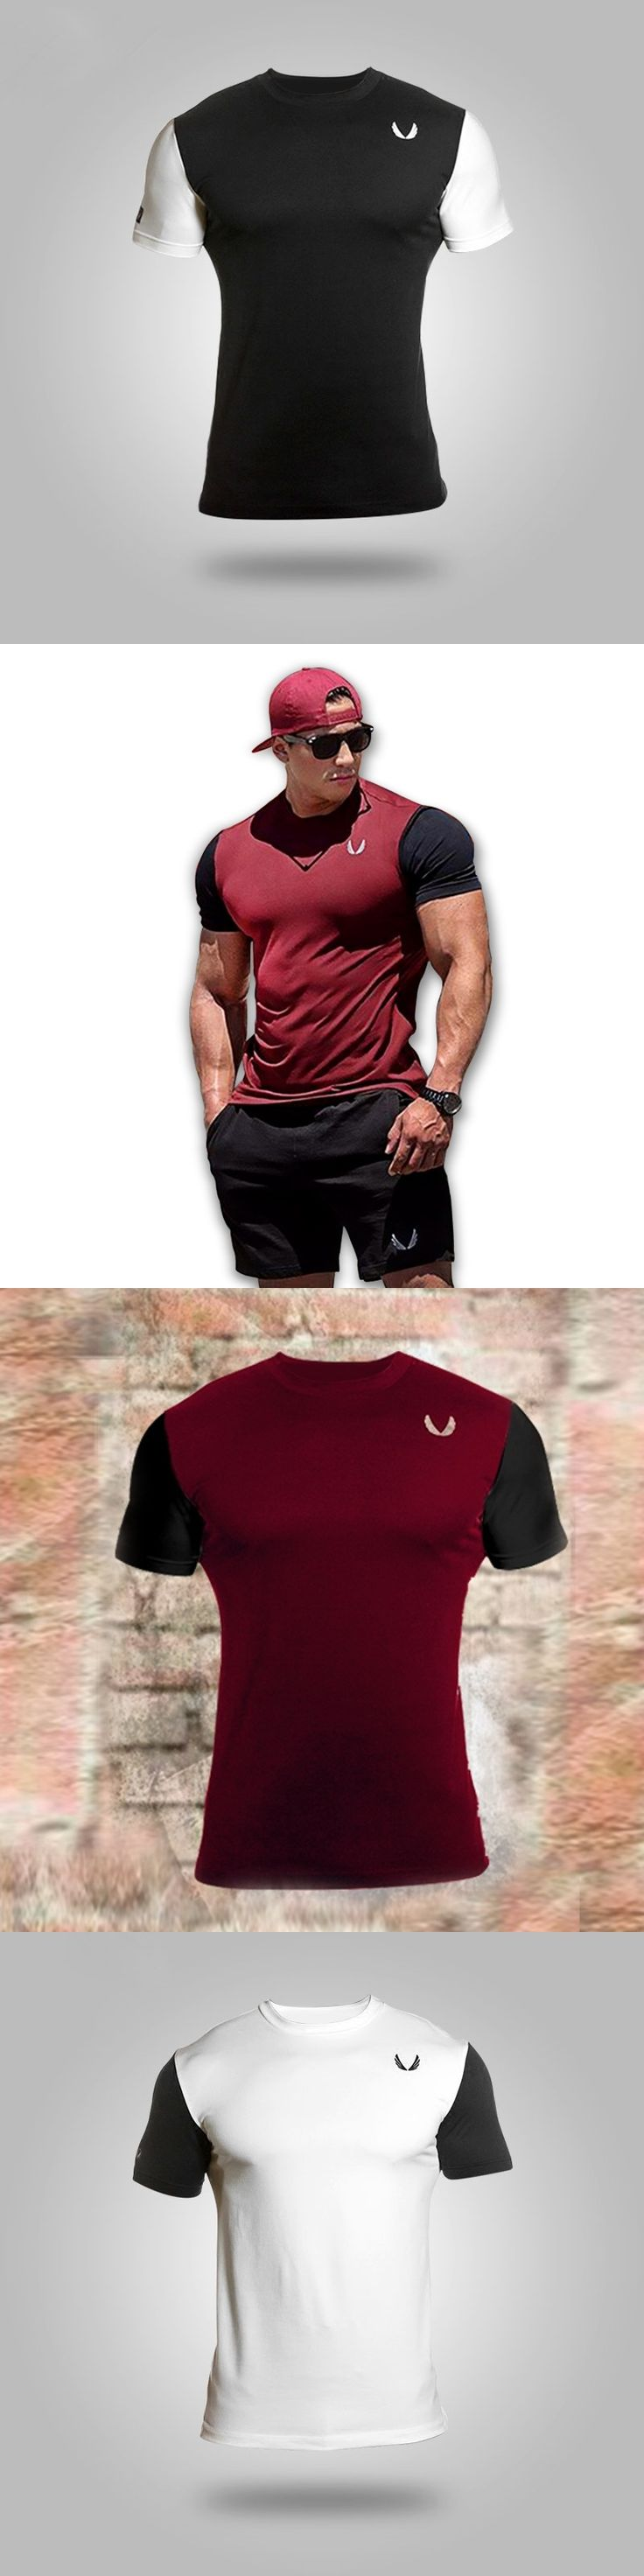 Stylish Men T Shirt raglan Streetwear Cotton Fitness Summer One Piece Slim Fit t-shirt Cheap Clothing for Male Fashion